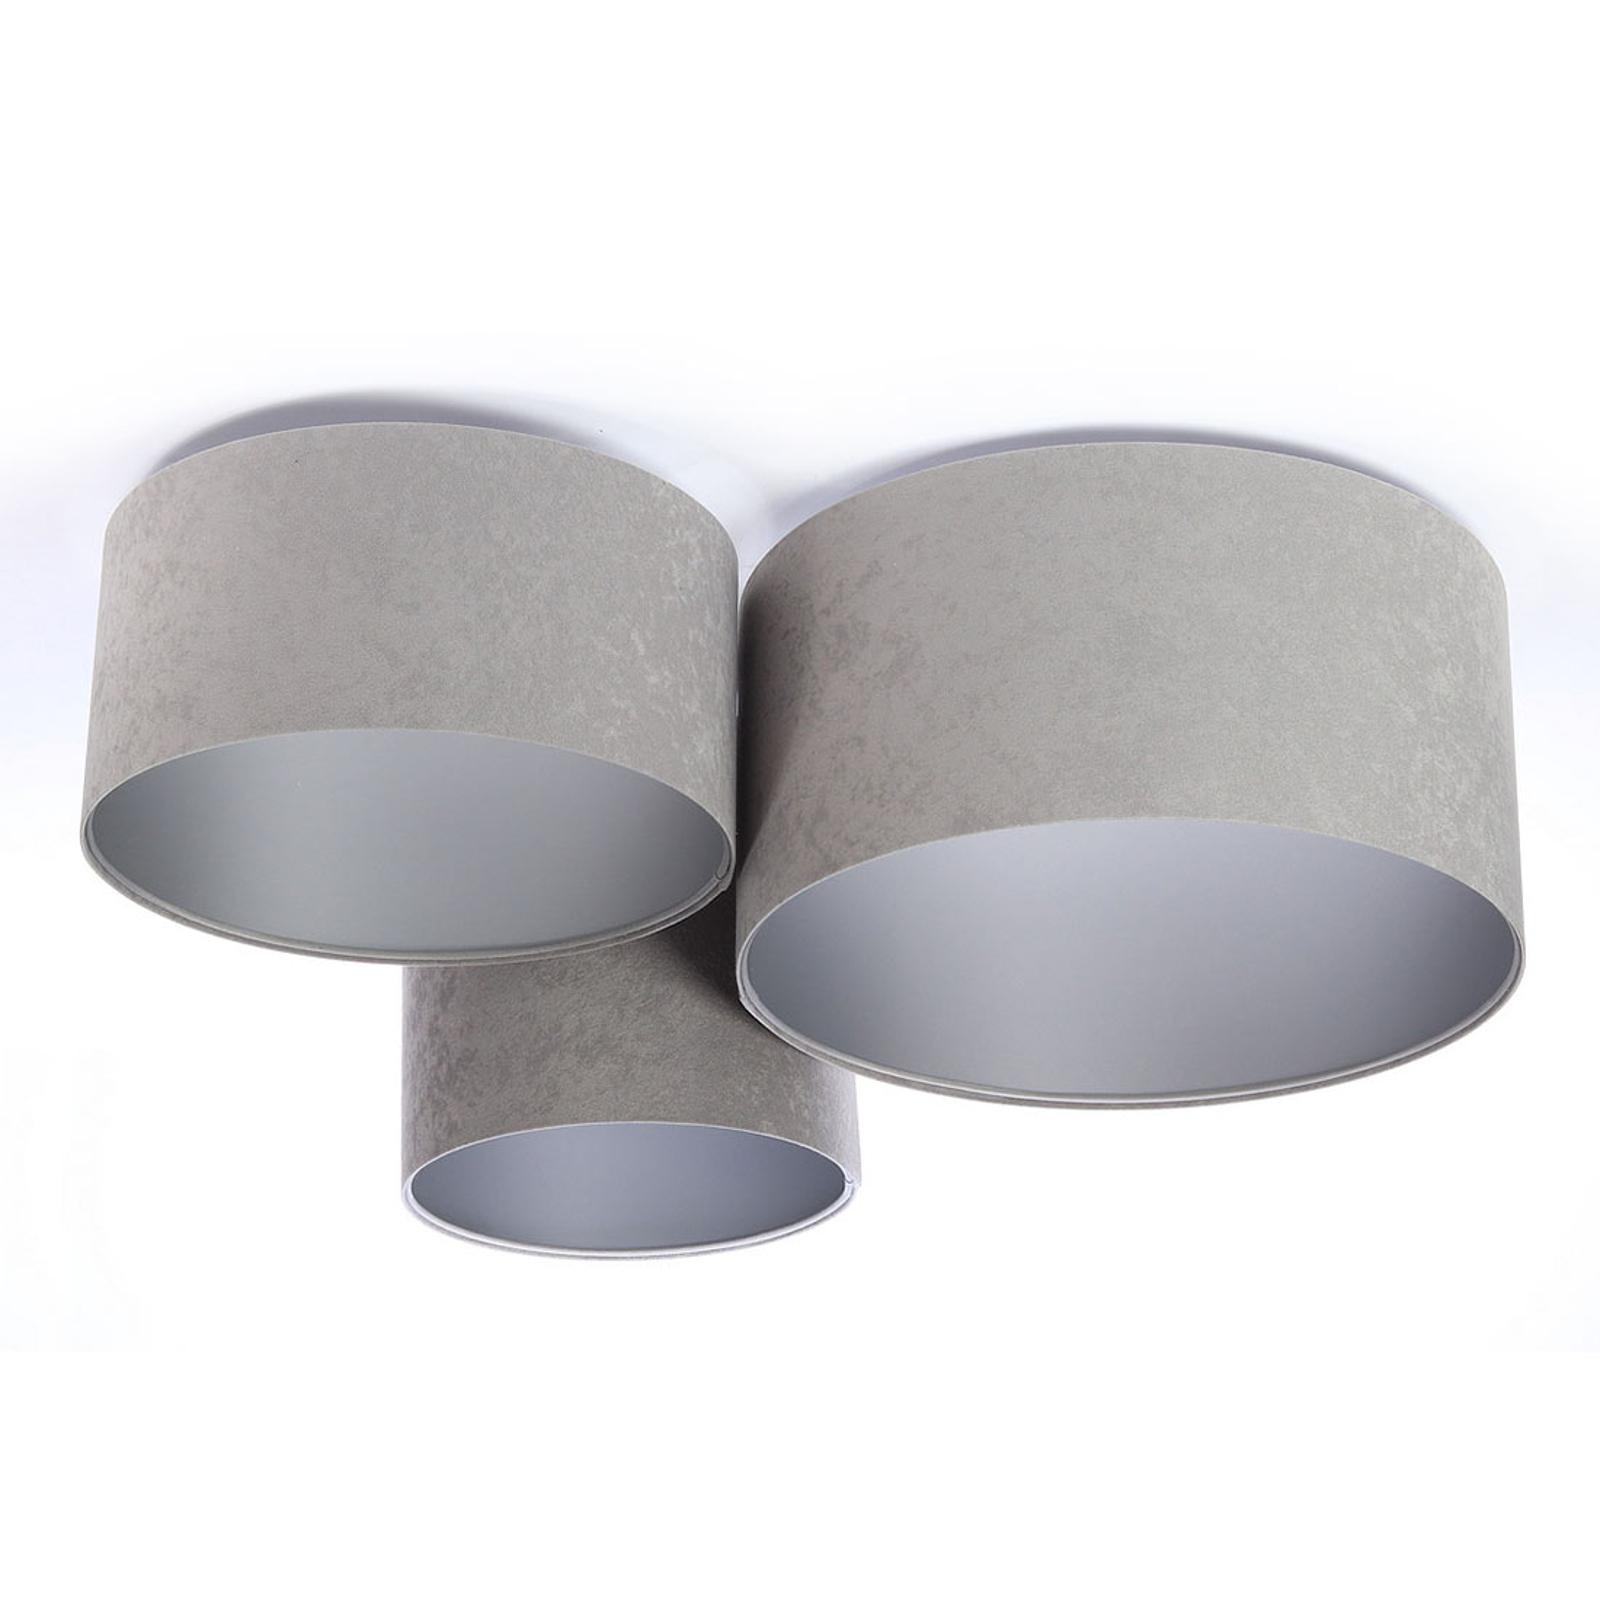 Taklampe 080, 3 lyskilder, lysegrå-sølv